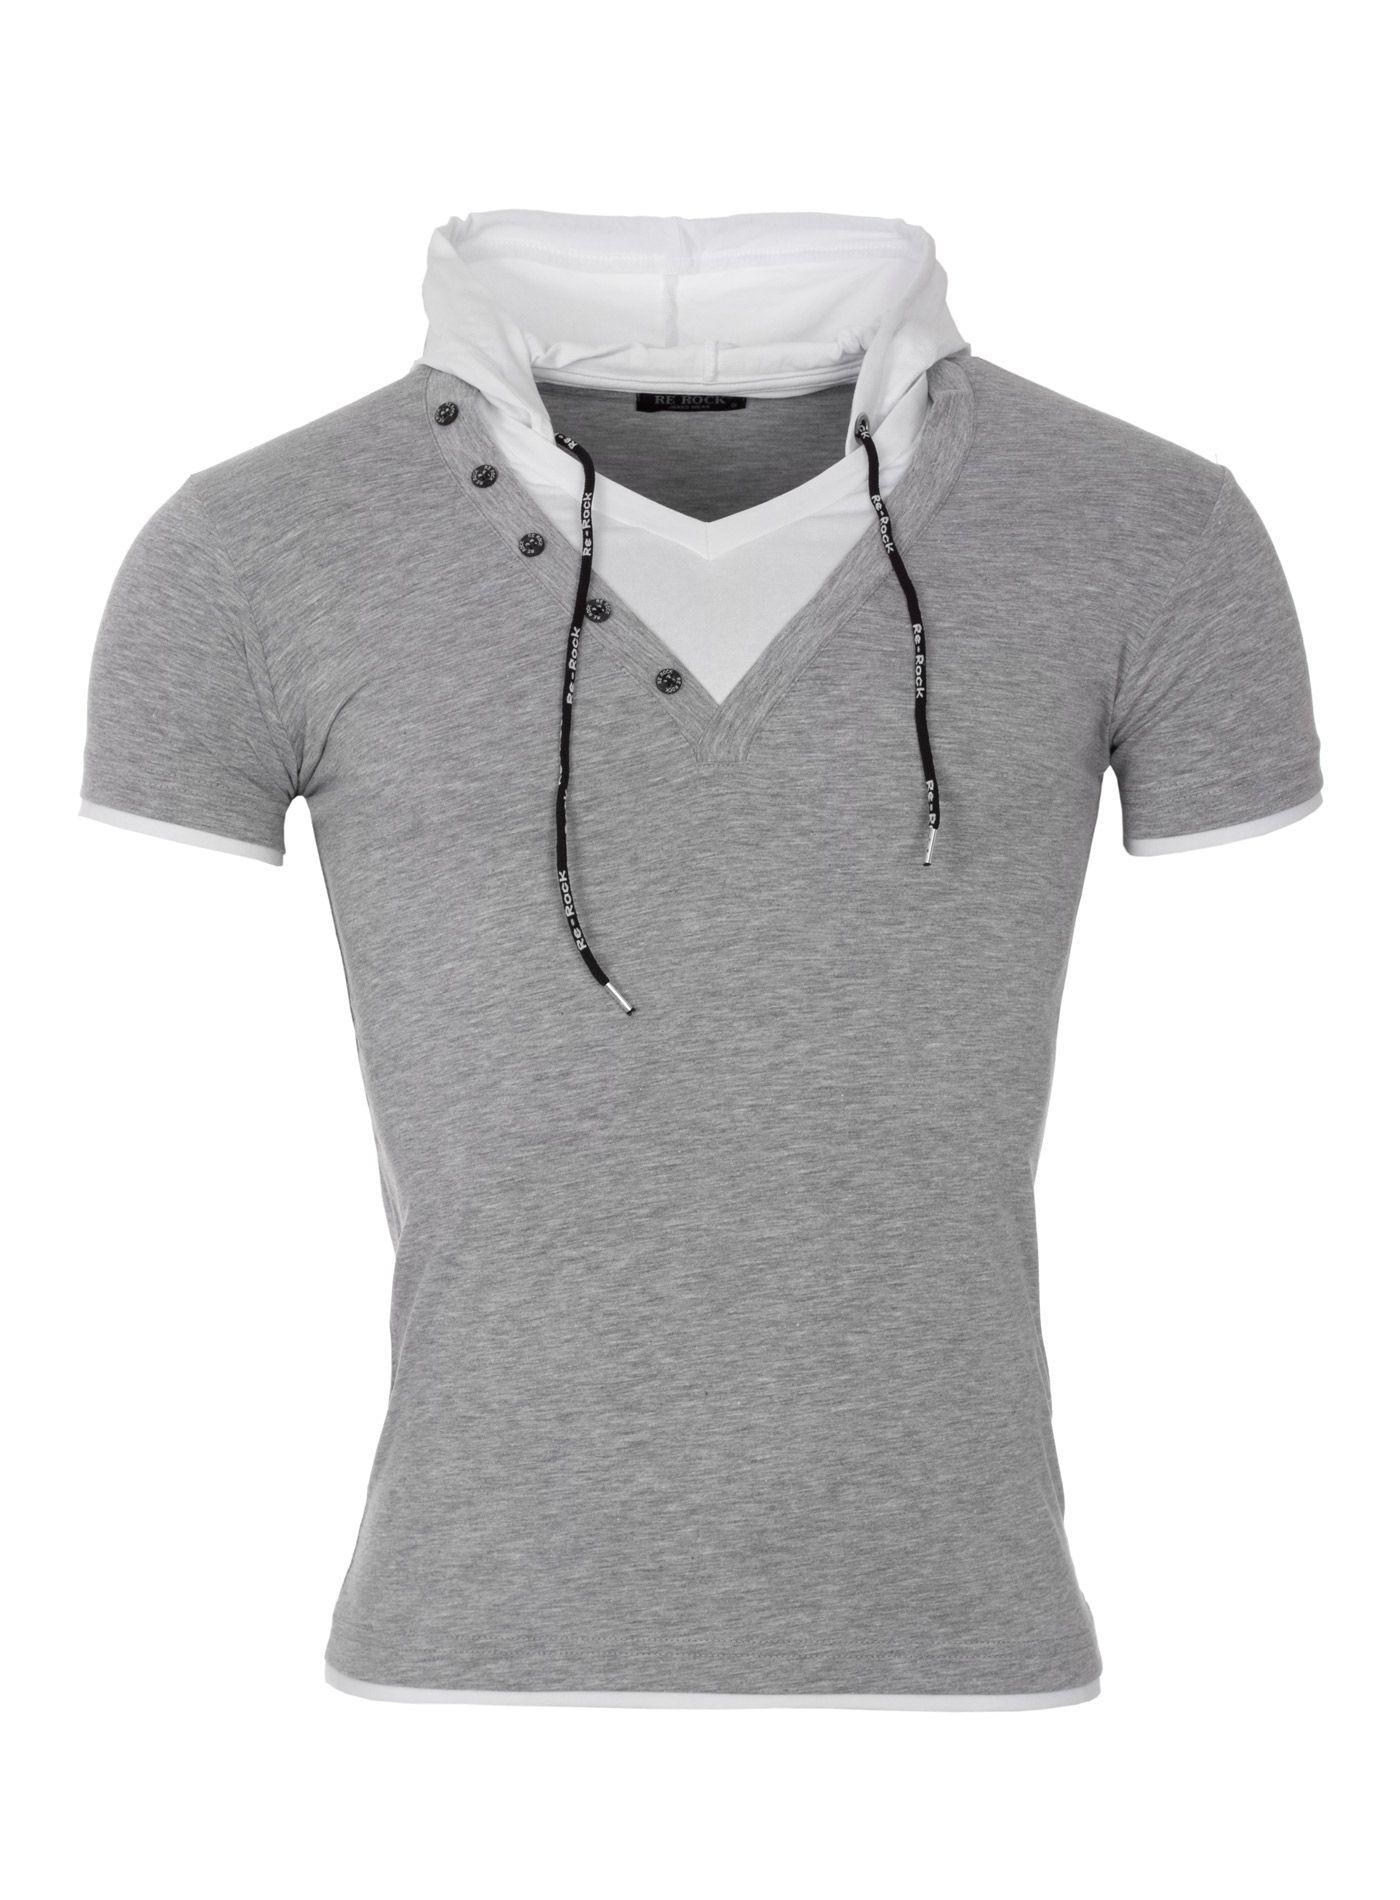 Rerock T Shirt Run Mit Kapuze Grey With Images Shirts Mens Tshirts T Shirt